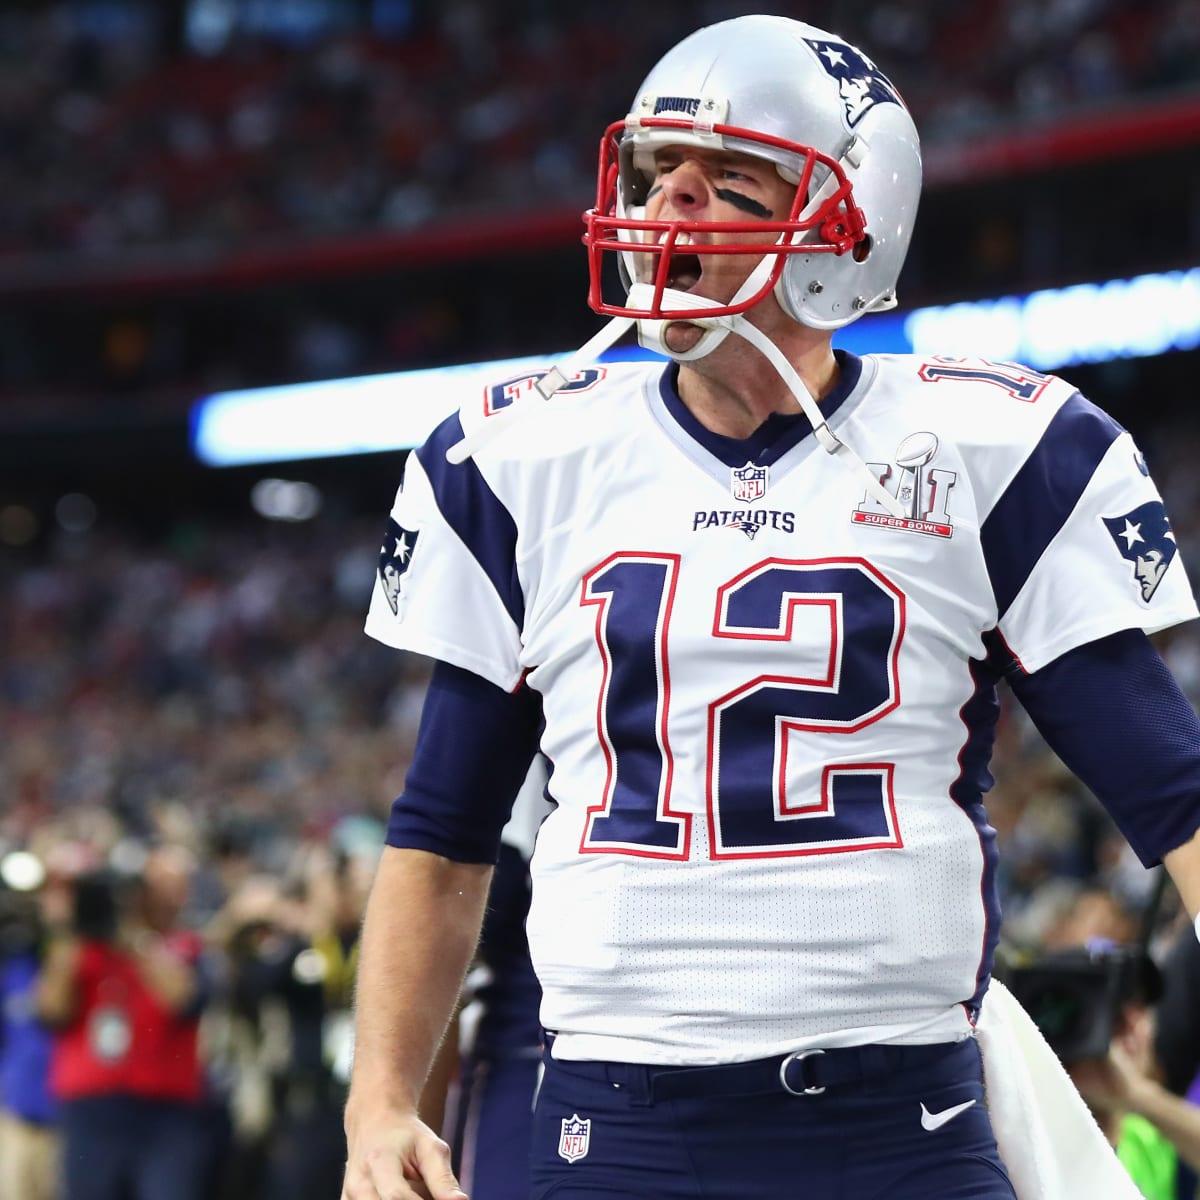 Patriots-Eagles Super Bowl Uniforms: New England in white - Sports ...